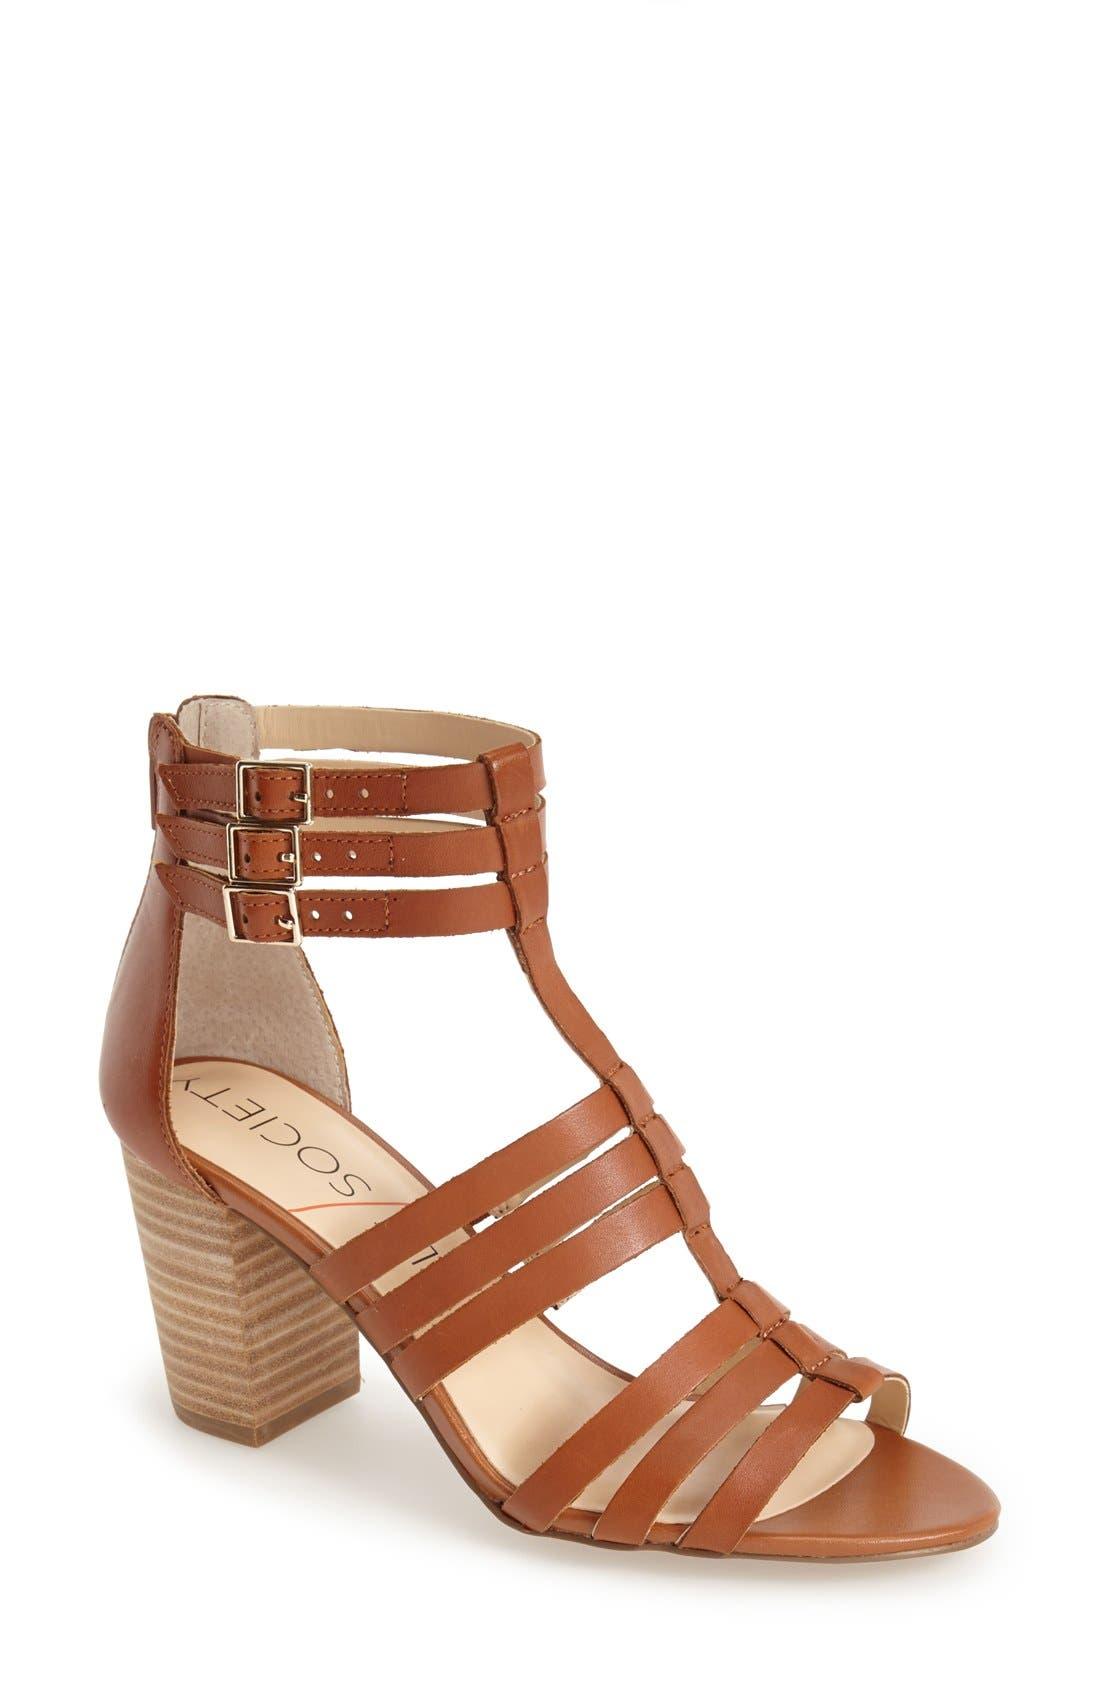 Alternate Image 1 Selected - Sole Society 'Elise' Gladiator Sandal (Women)